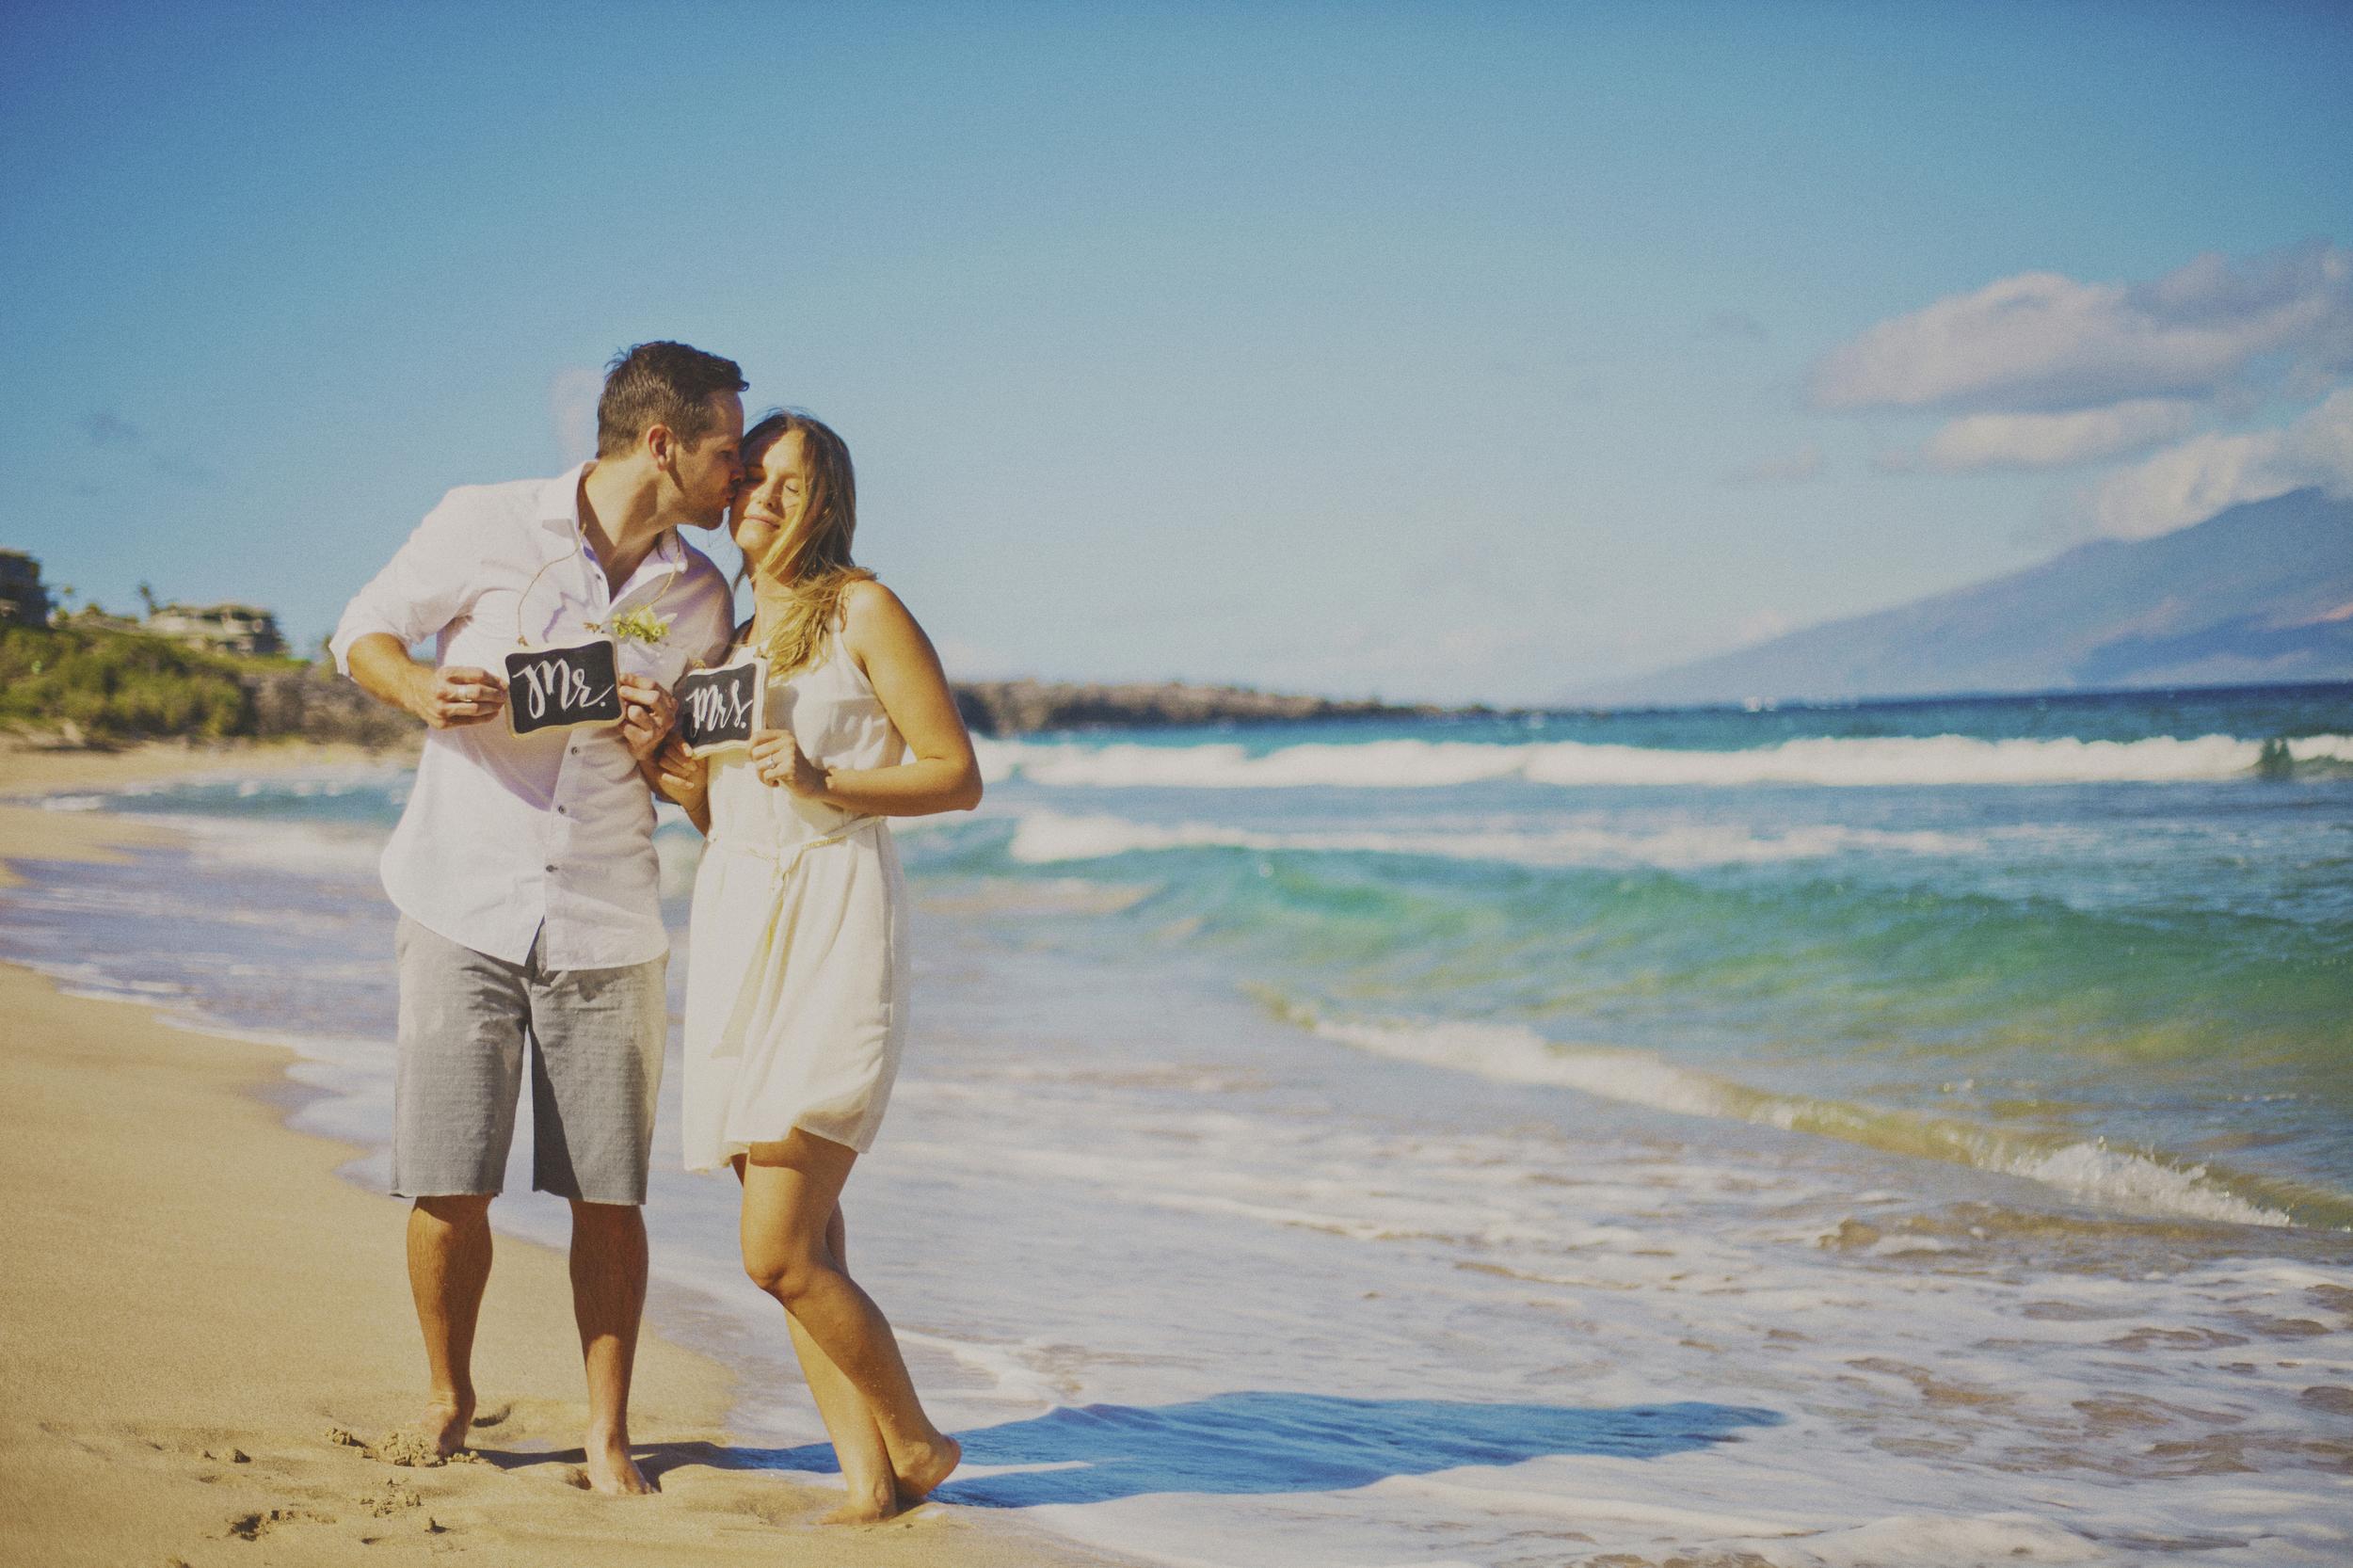 angie-diaz-photography-maui-elopement-oneloa-ironwoods-beach-1.jpg